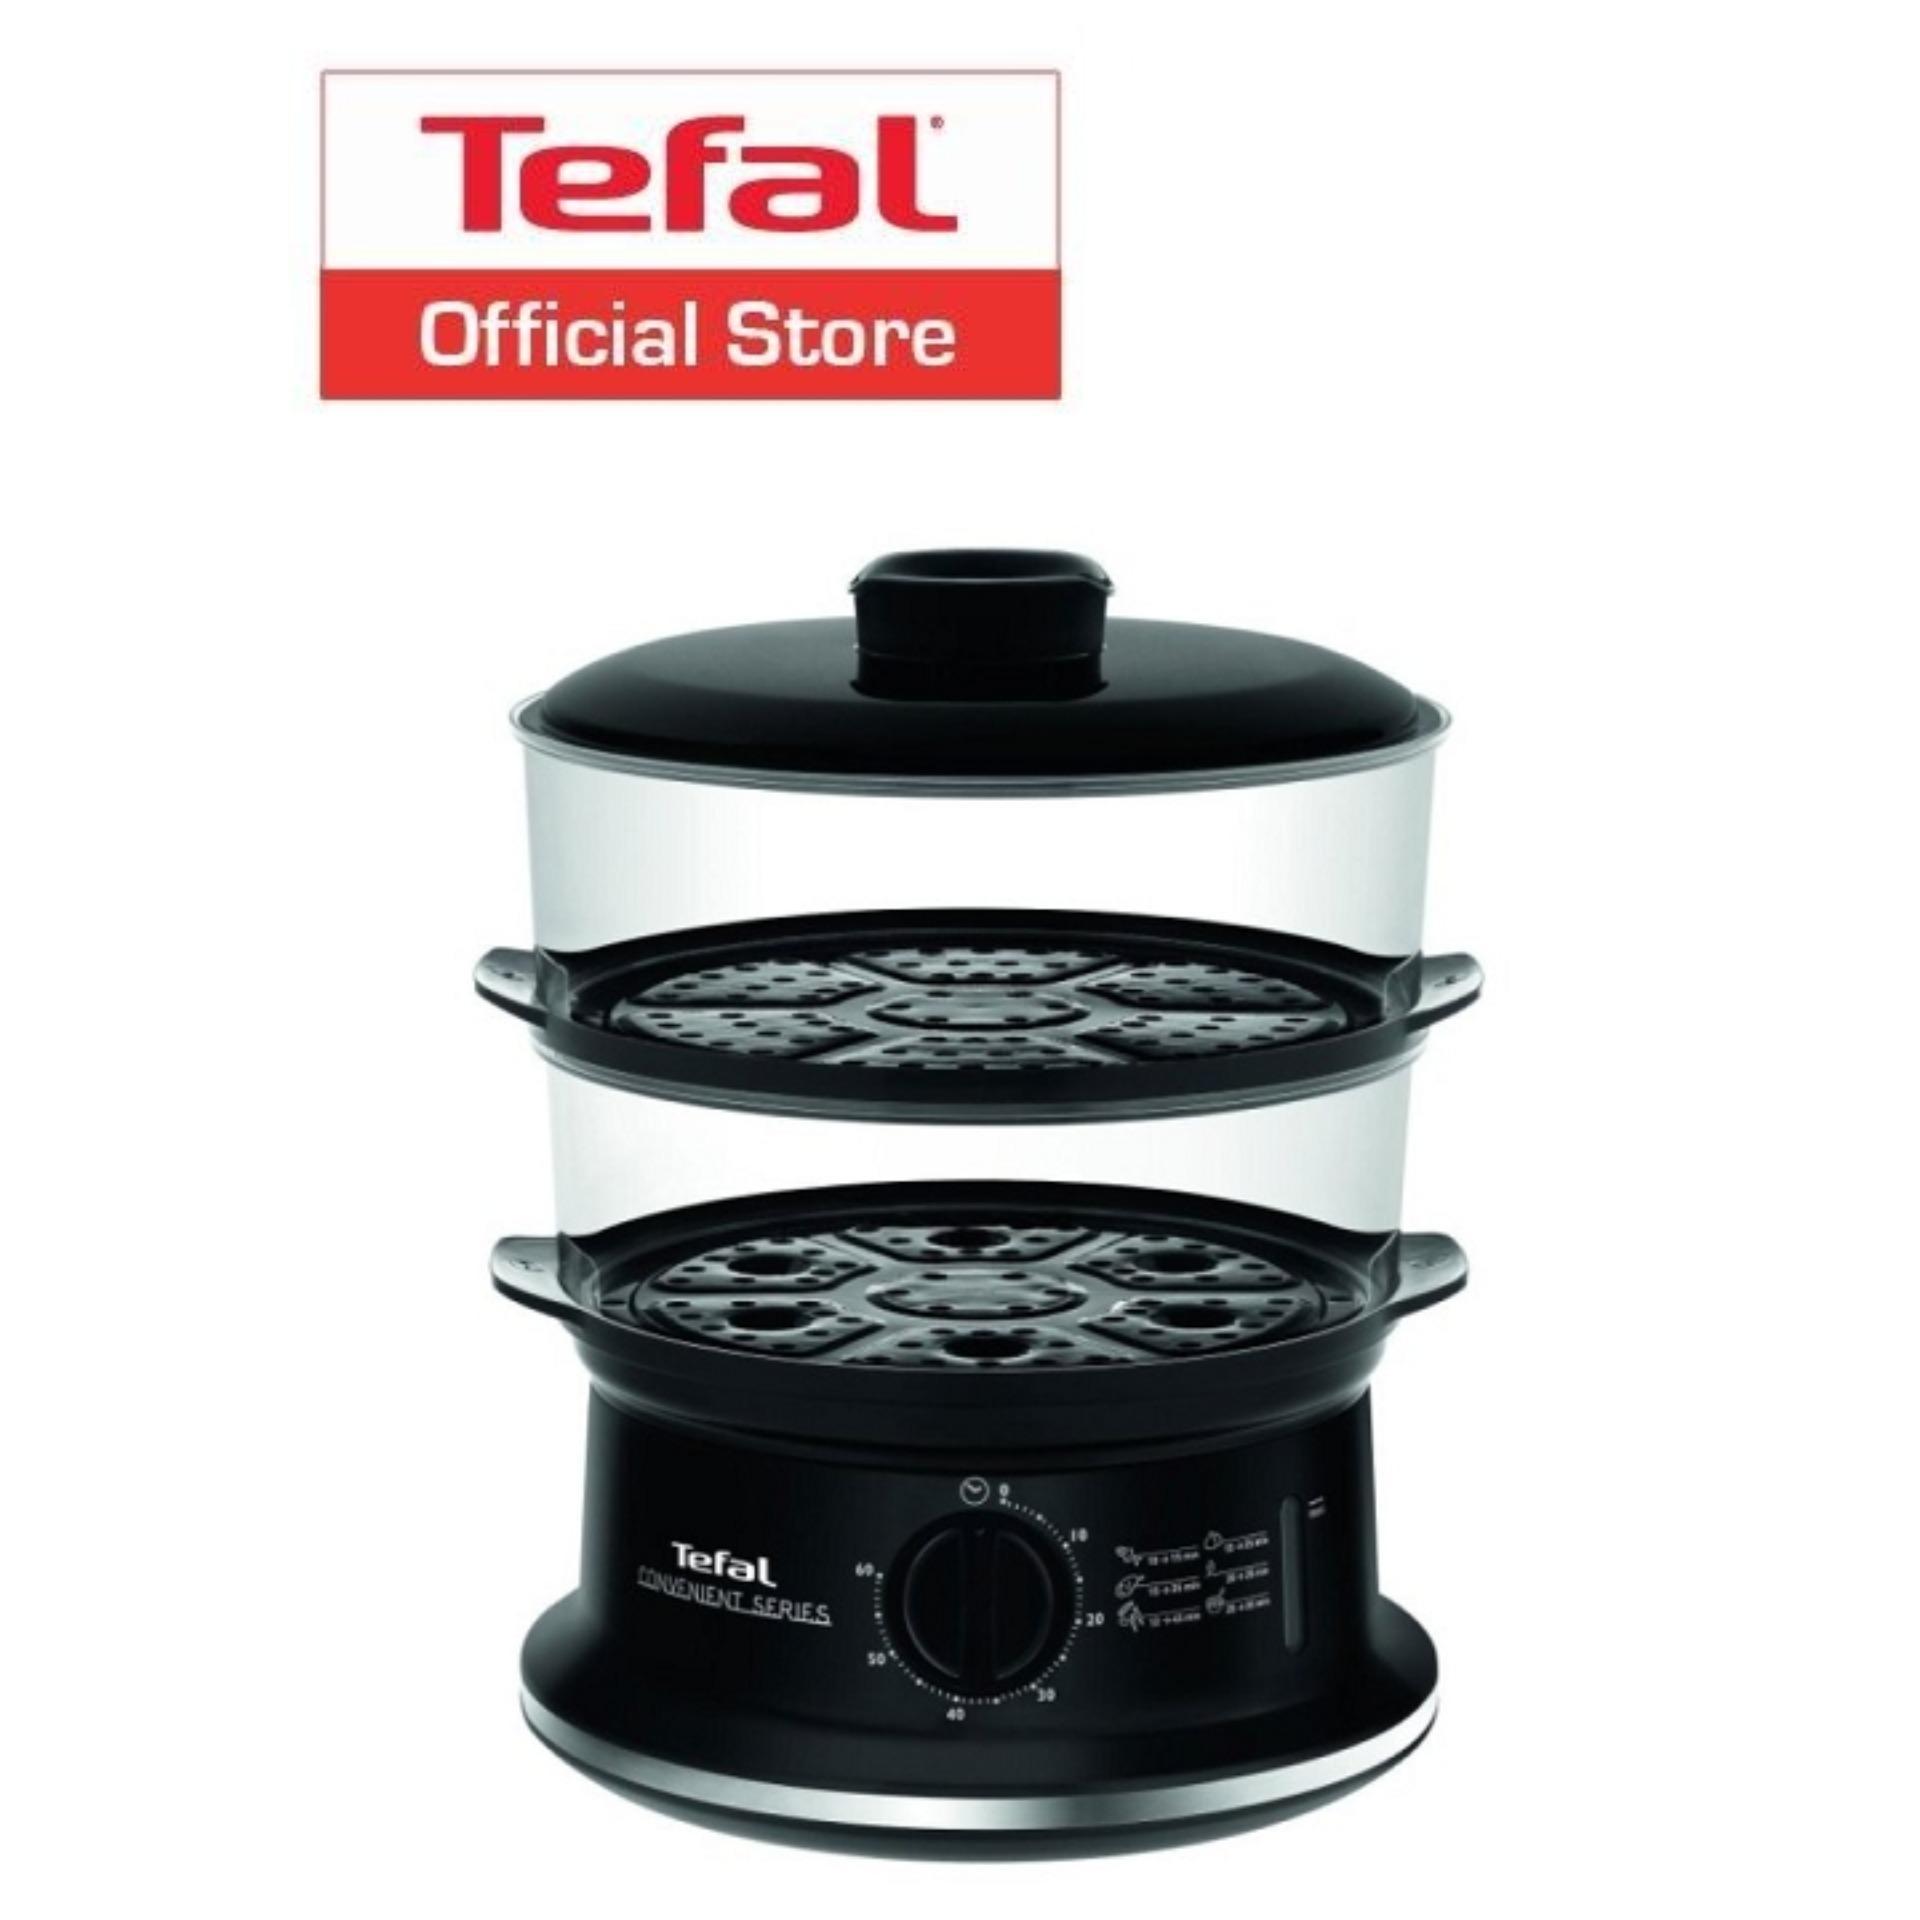 Tefal Convenient Series Steamer VC1401